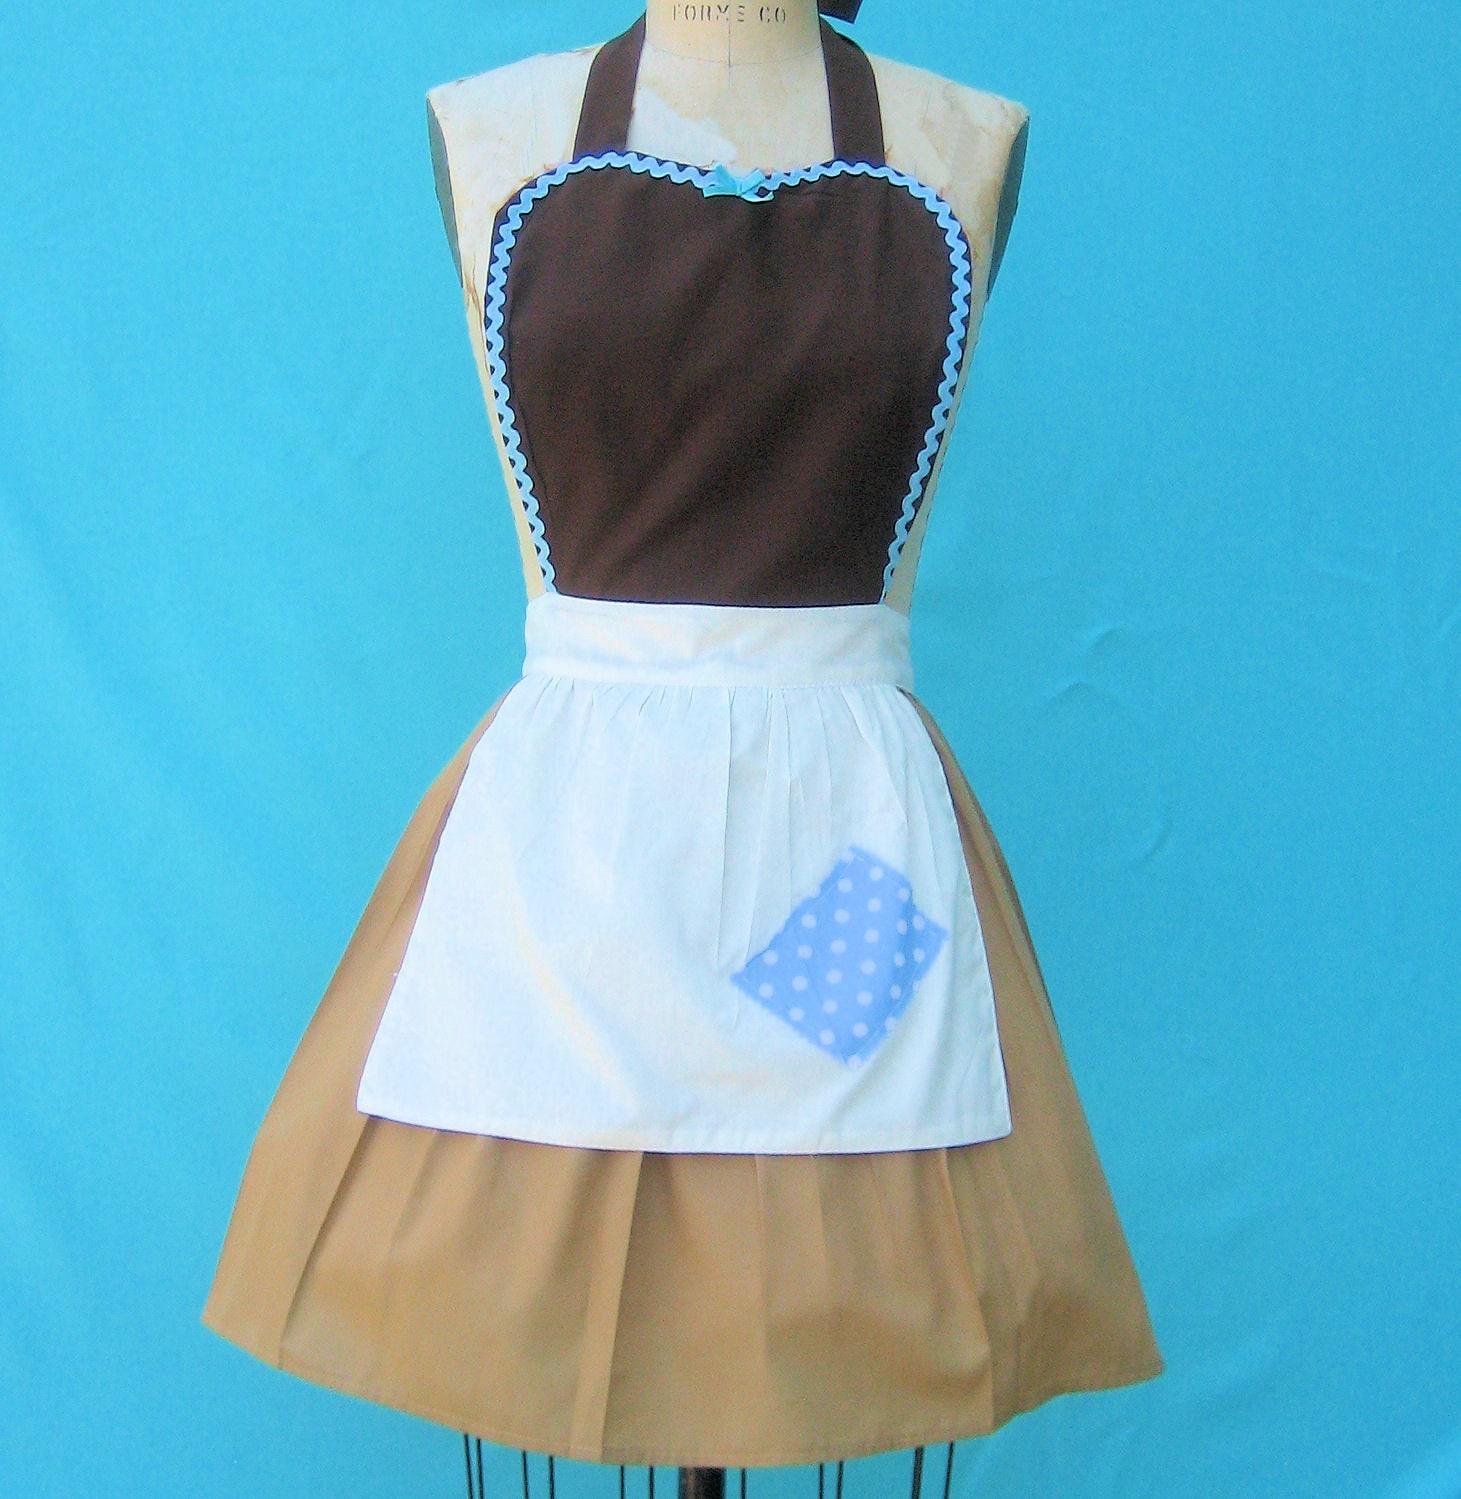 White pinafore apron costume - Cinderella Apron Cinderella Work Apron Princess Apron Womens Full Apron Cinderella Costume Cinderella Dress Up Cosplay Costume